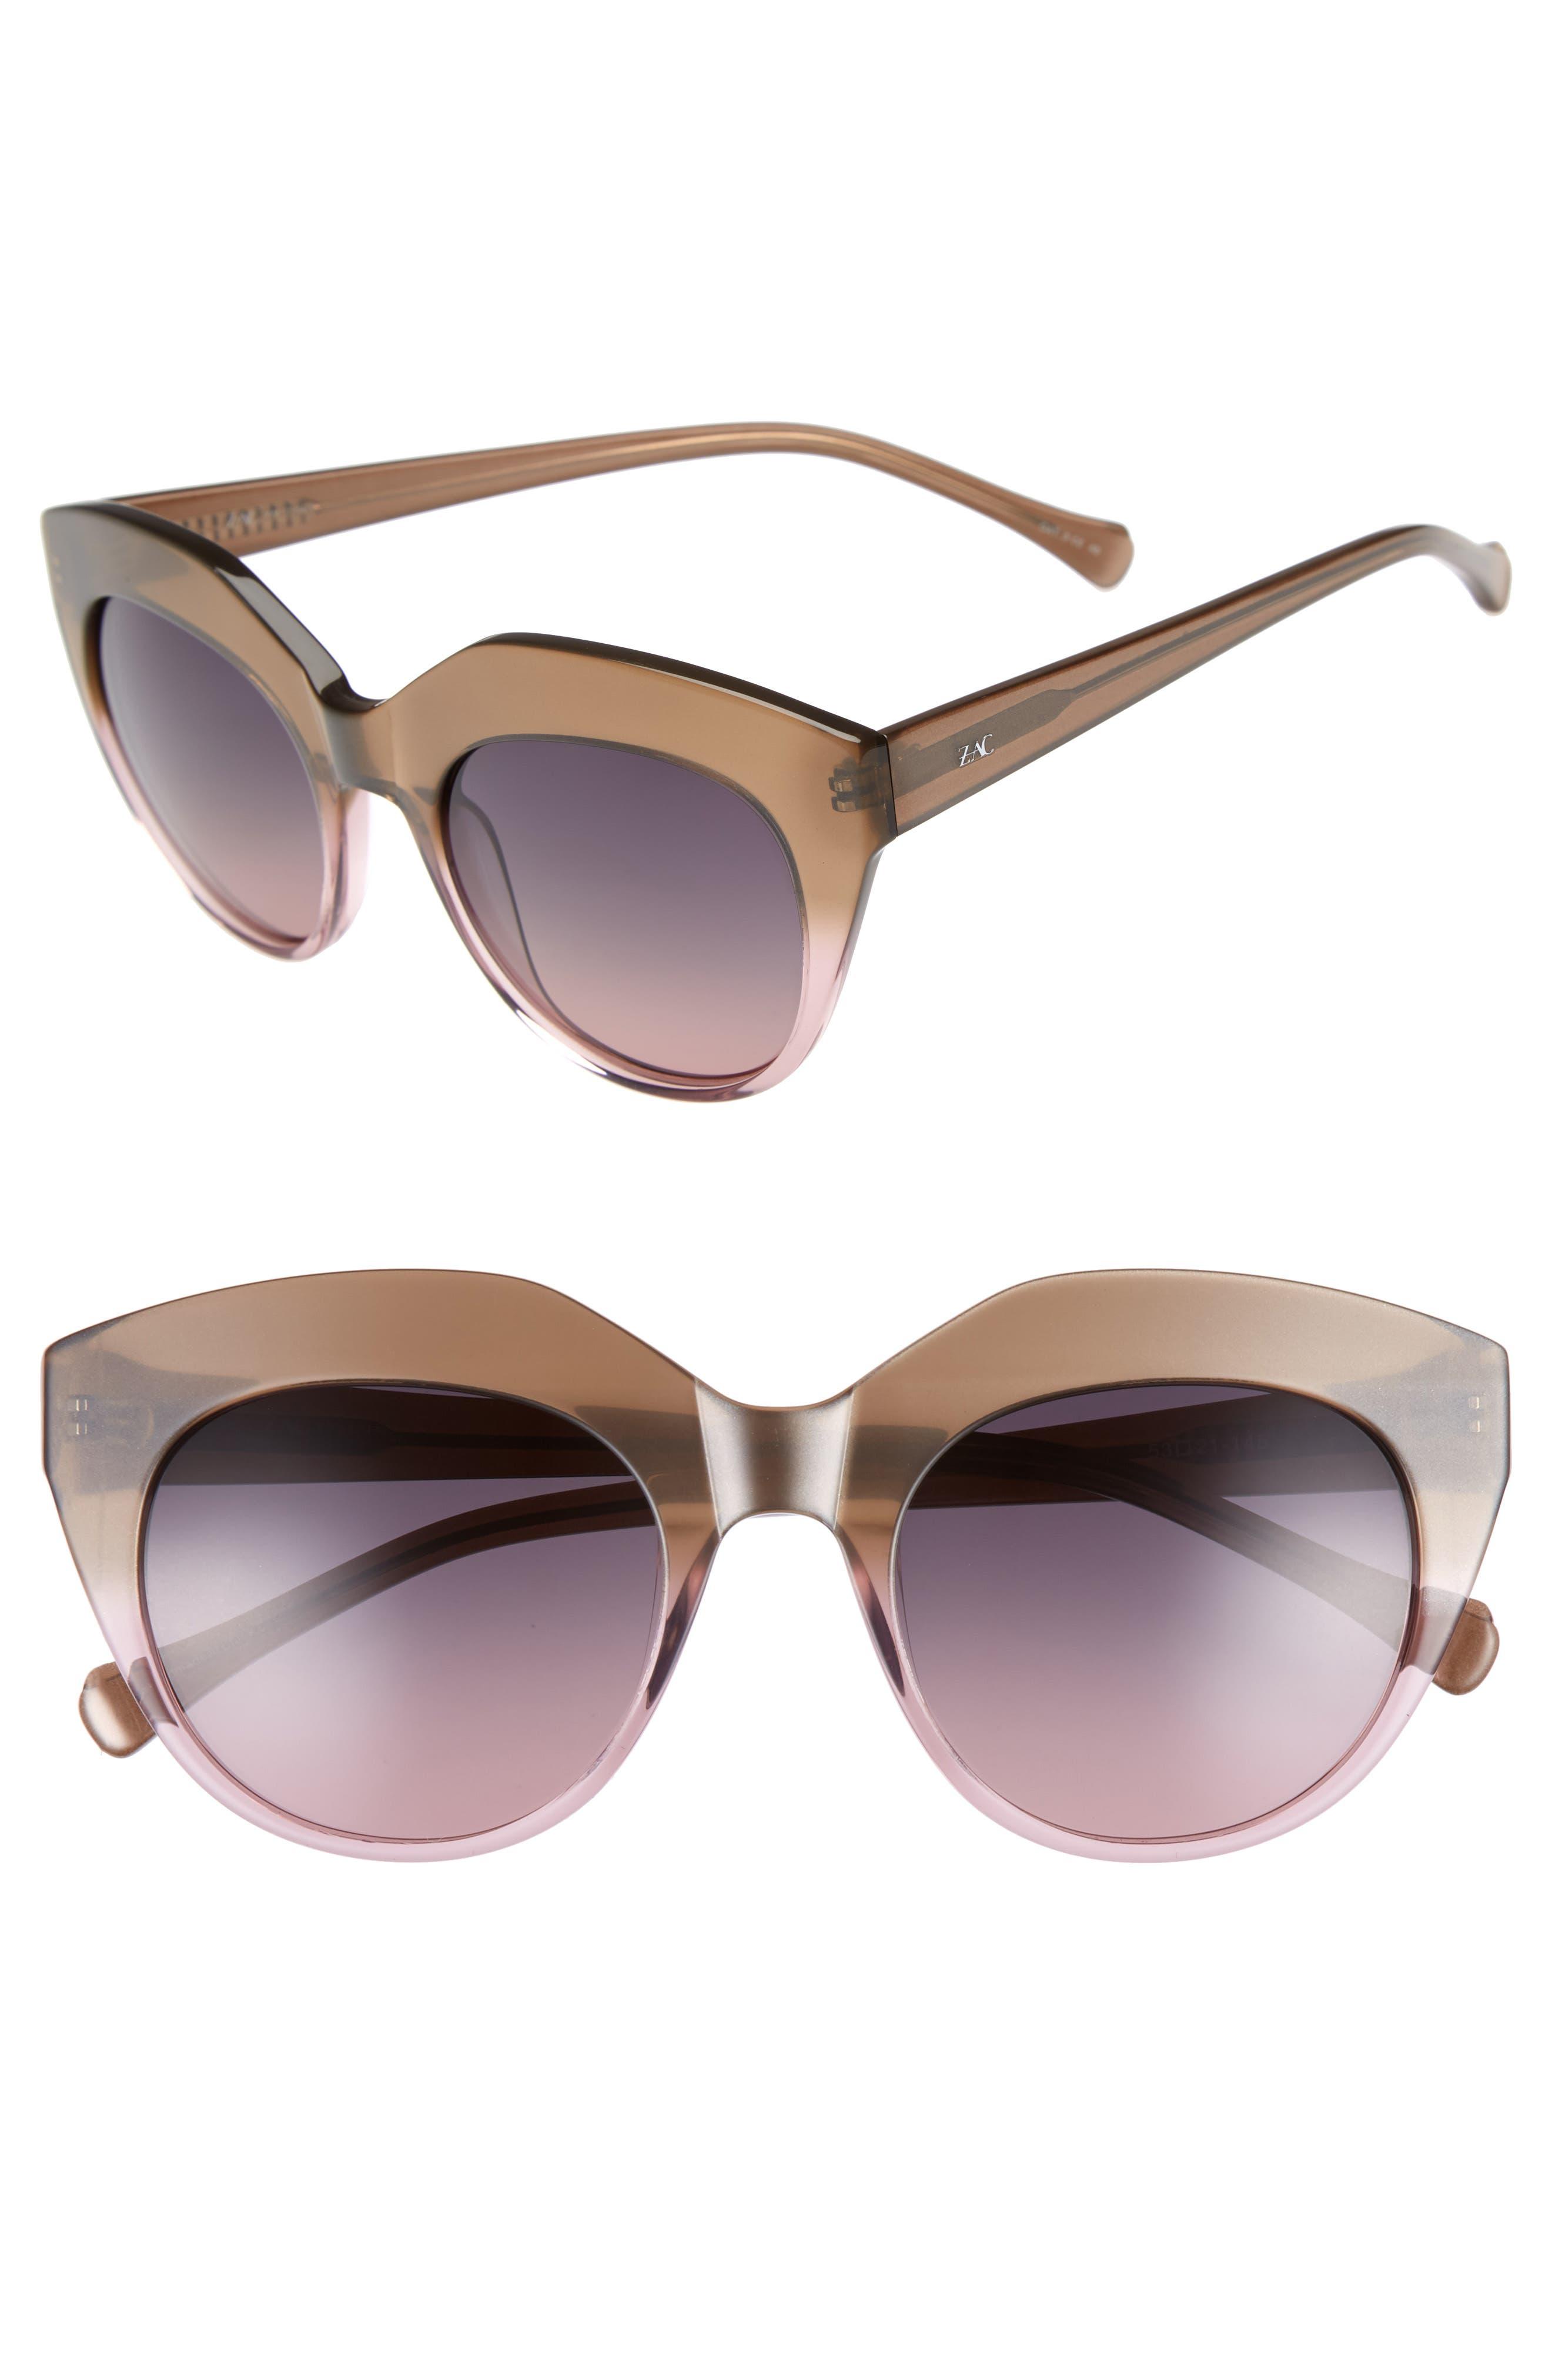 Tamika 53mm Polarized Sunglasses,                         Main,                         color, Dessert/ Berry